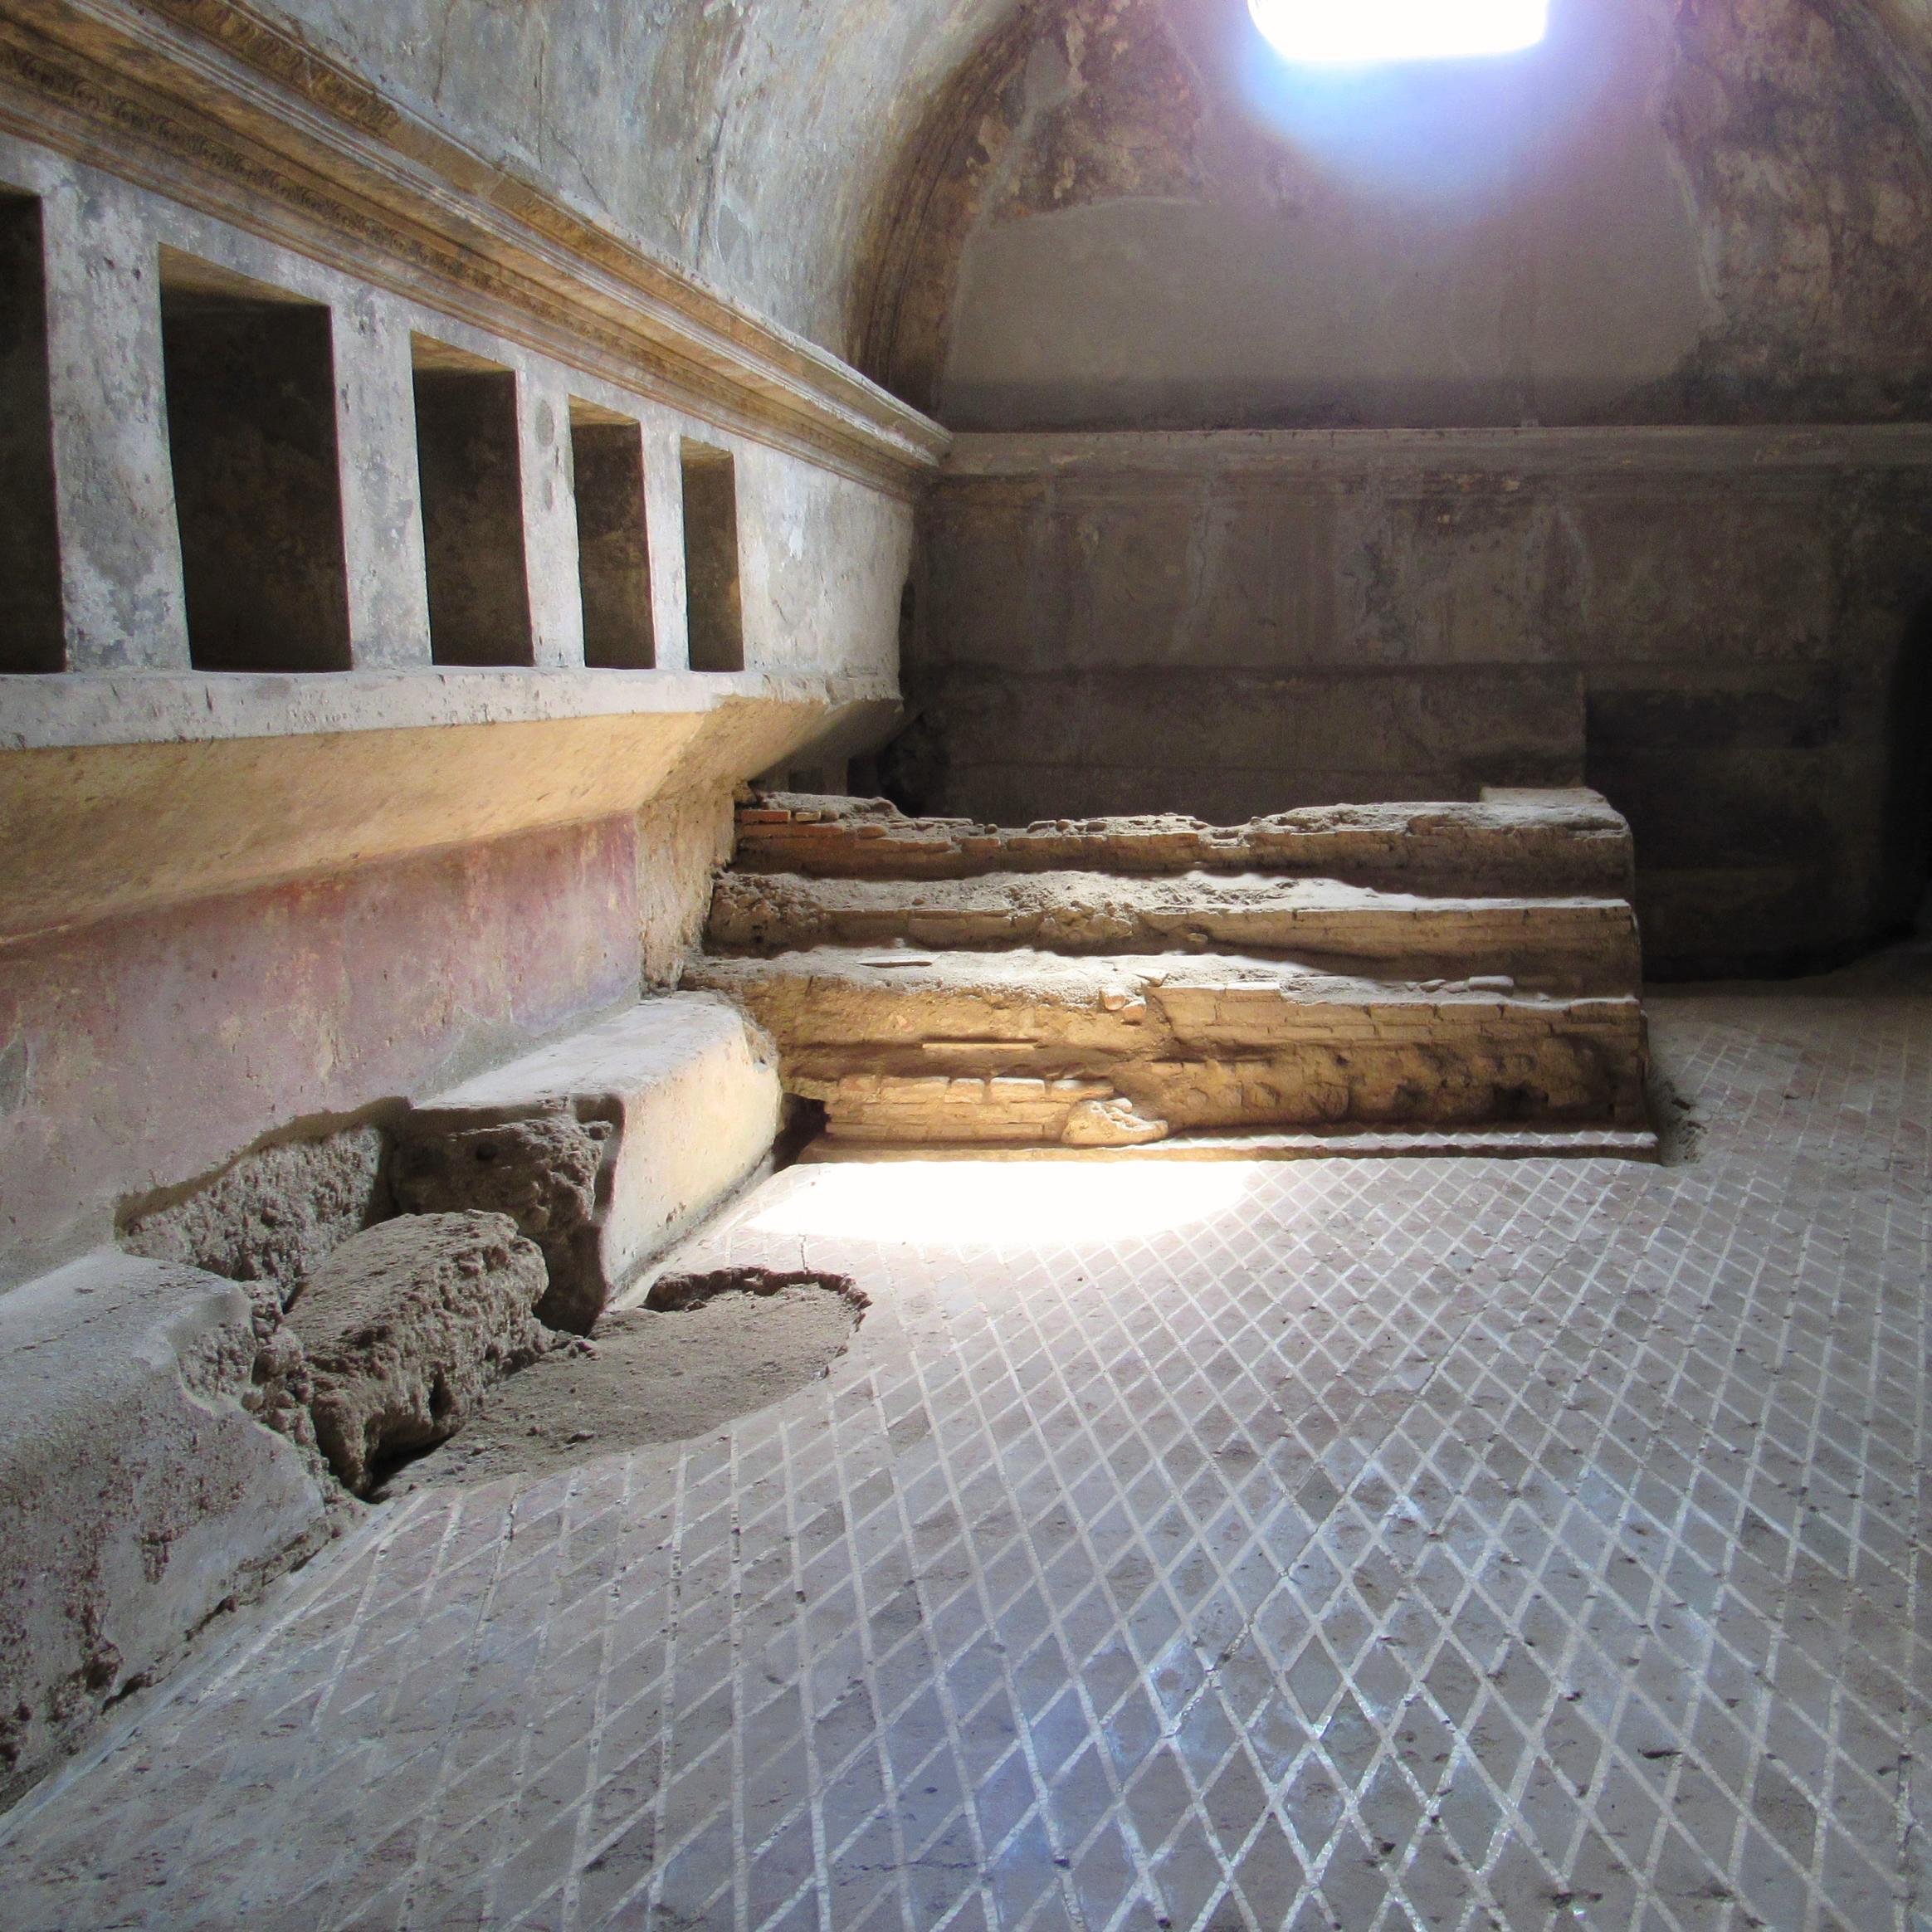 About Pompeii